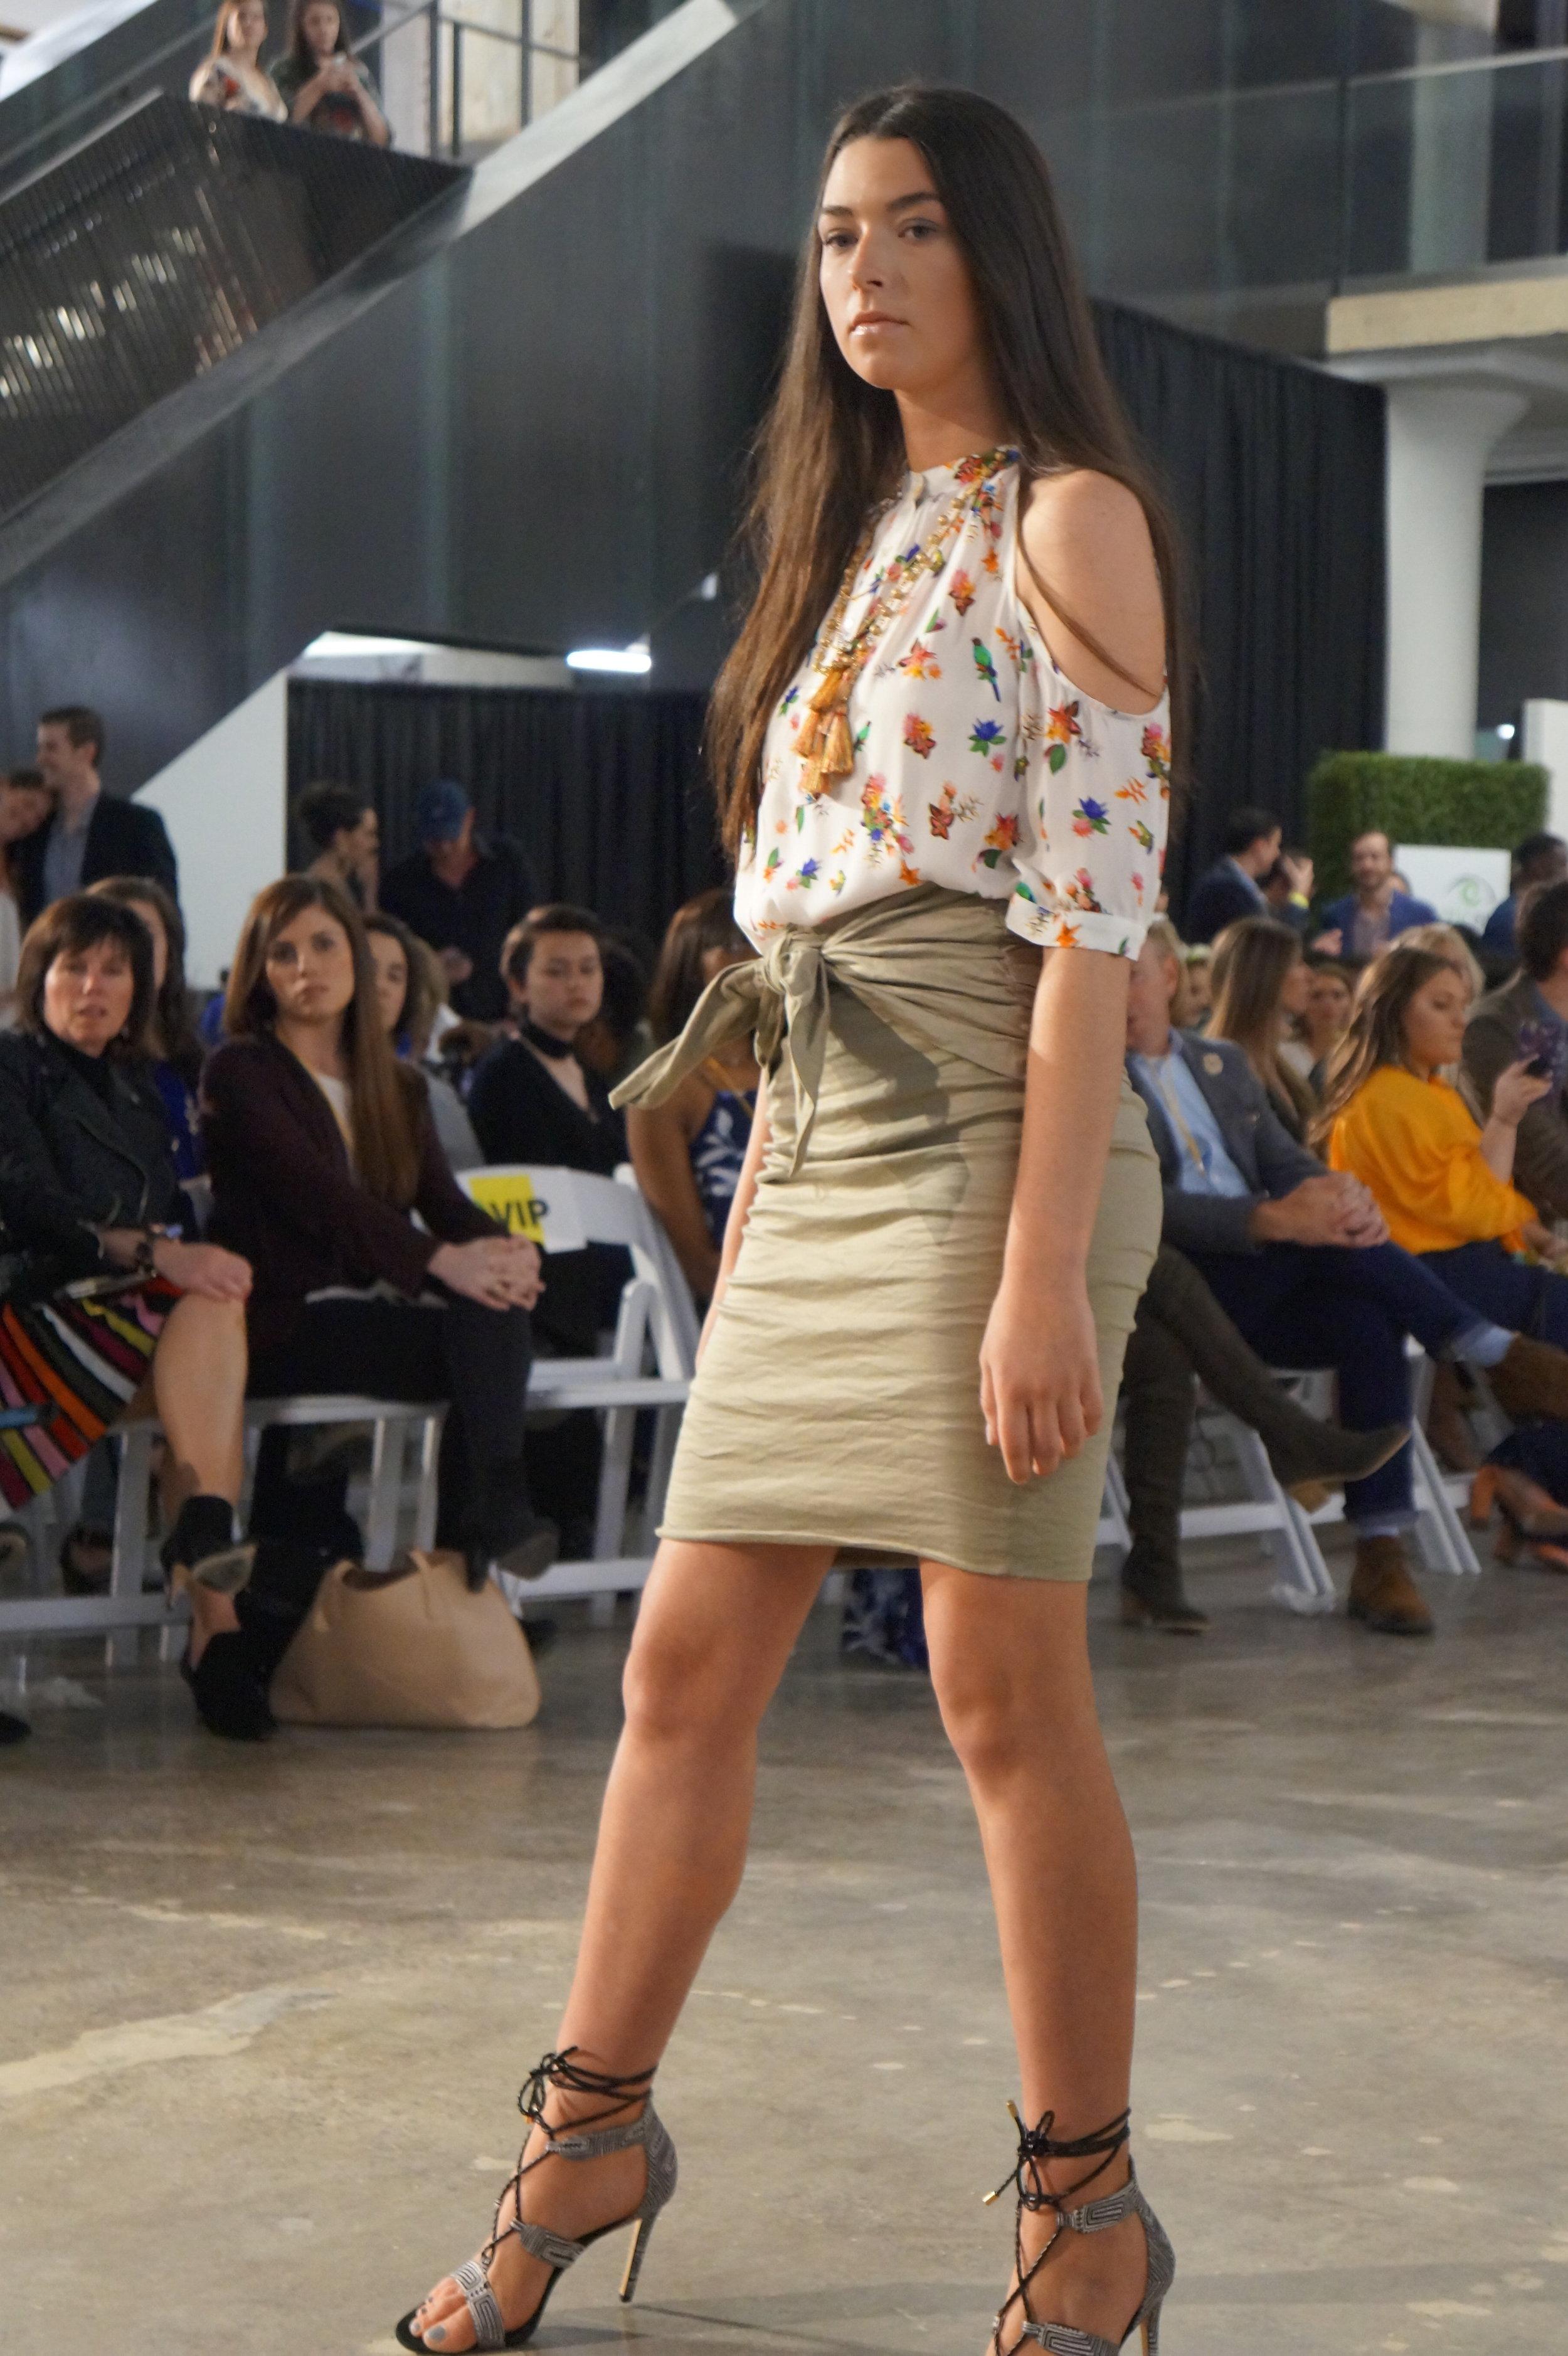 Andrea Fenise Memphis Fashion Blogger shares #memphisfashionweek featured designer's show